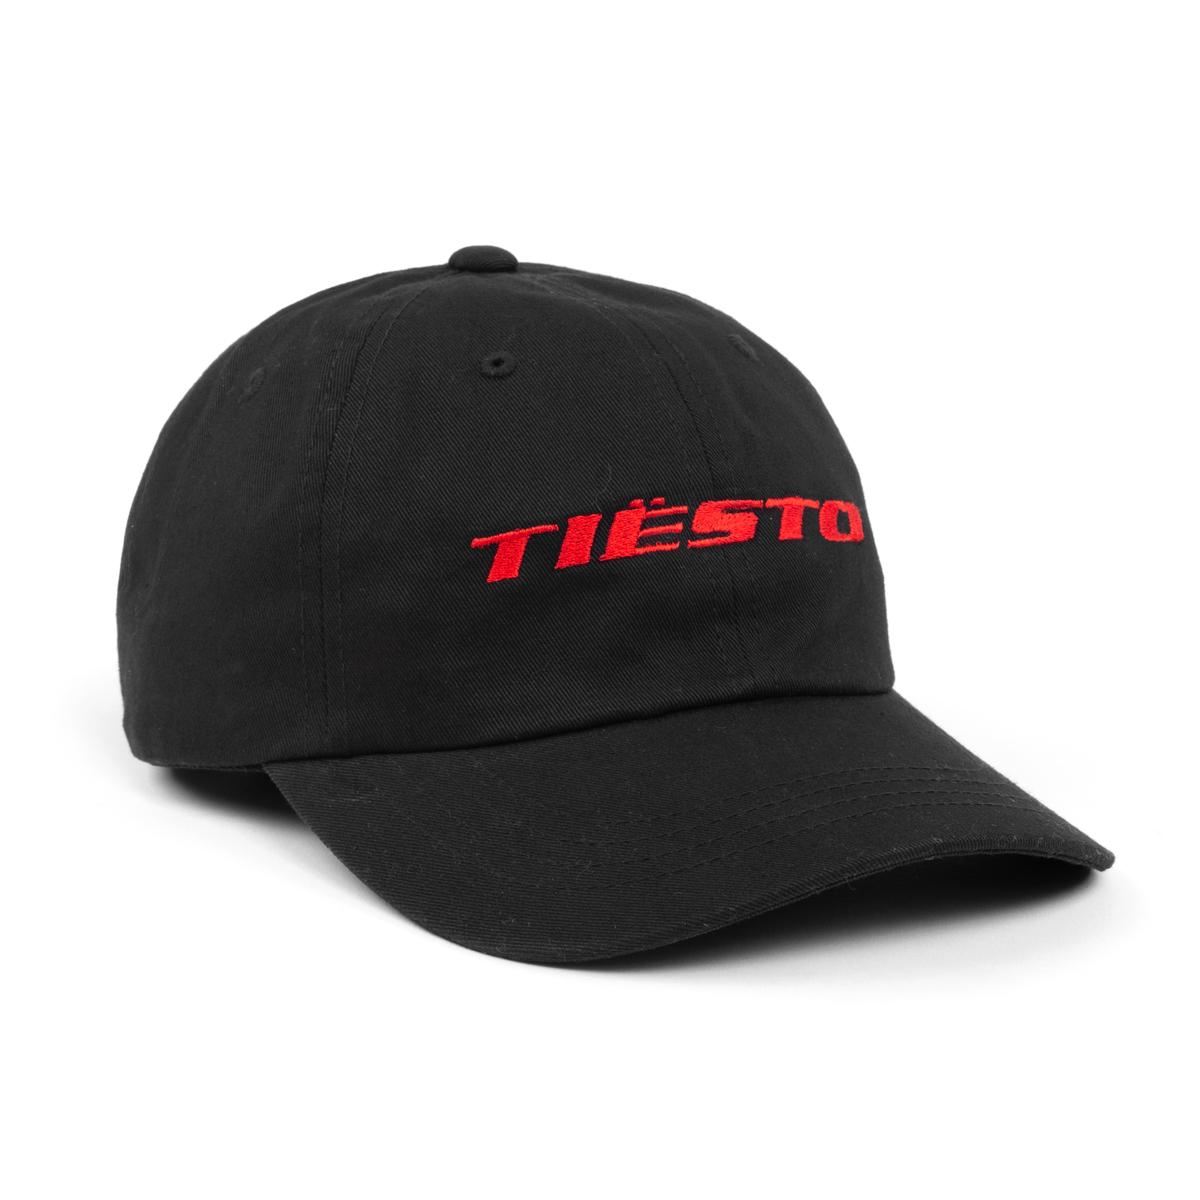 'Boxed' Logo Dad Hat - Red/Black